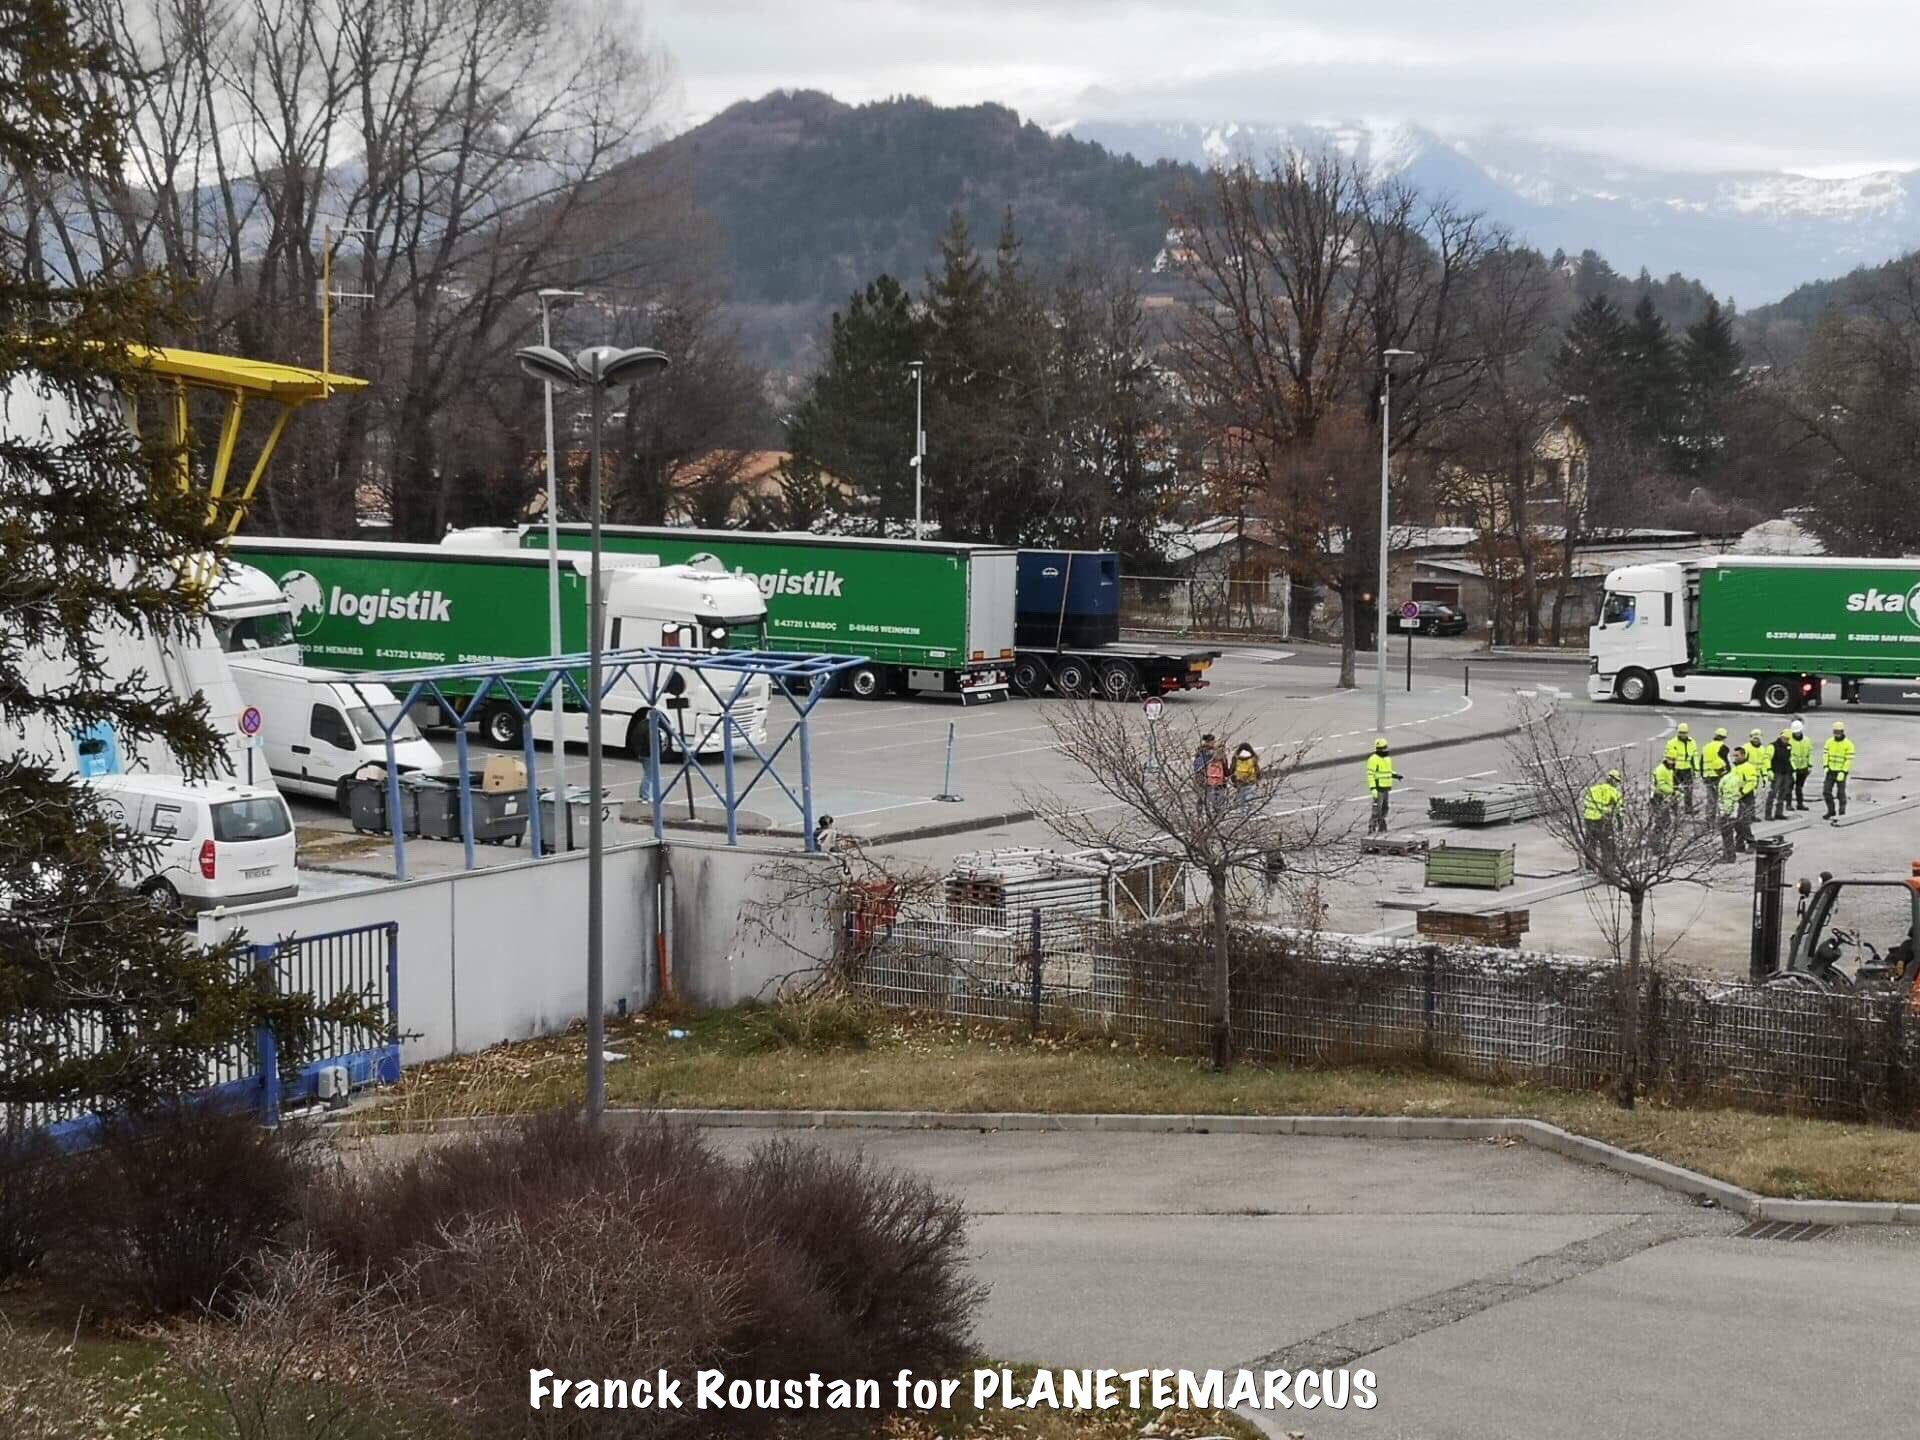 WRC: 87º Rallye Automobile de Monte-Carlo [22-27 de Enero] - Página 2 DxHvxSvWoAcXWDP